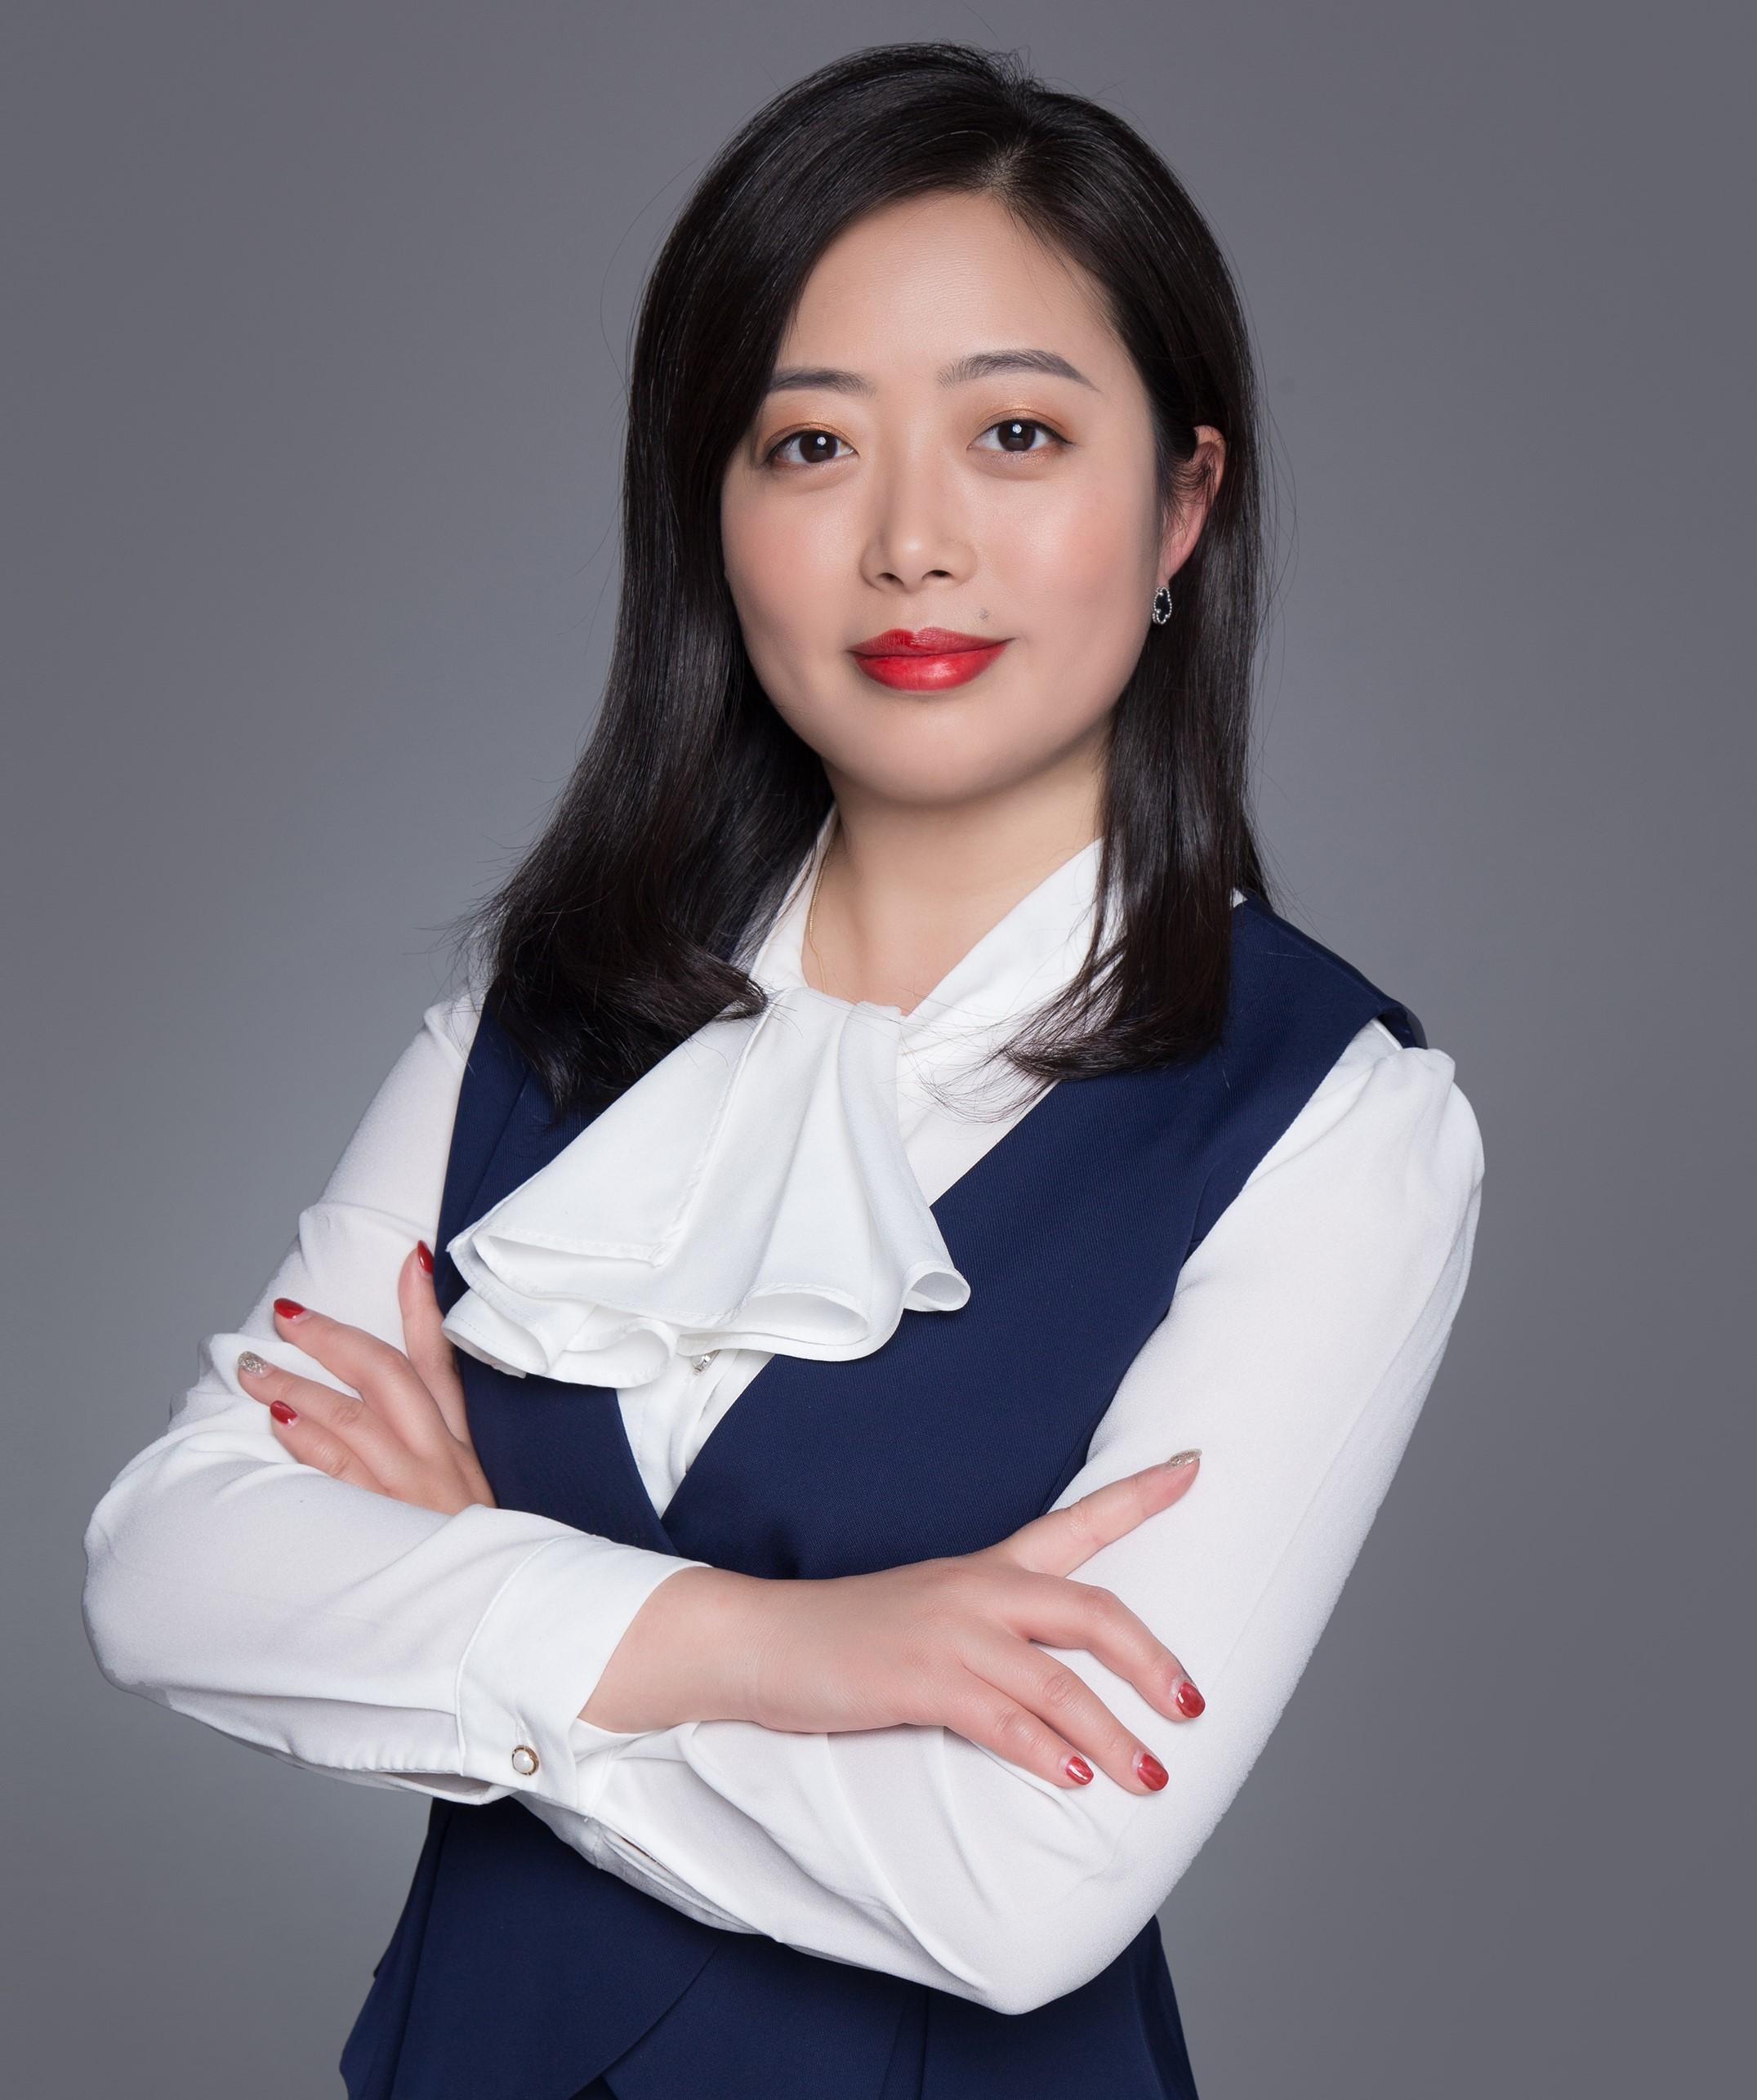 Chengxue Helena Qin